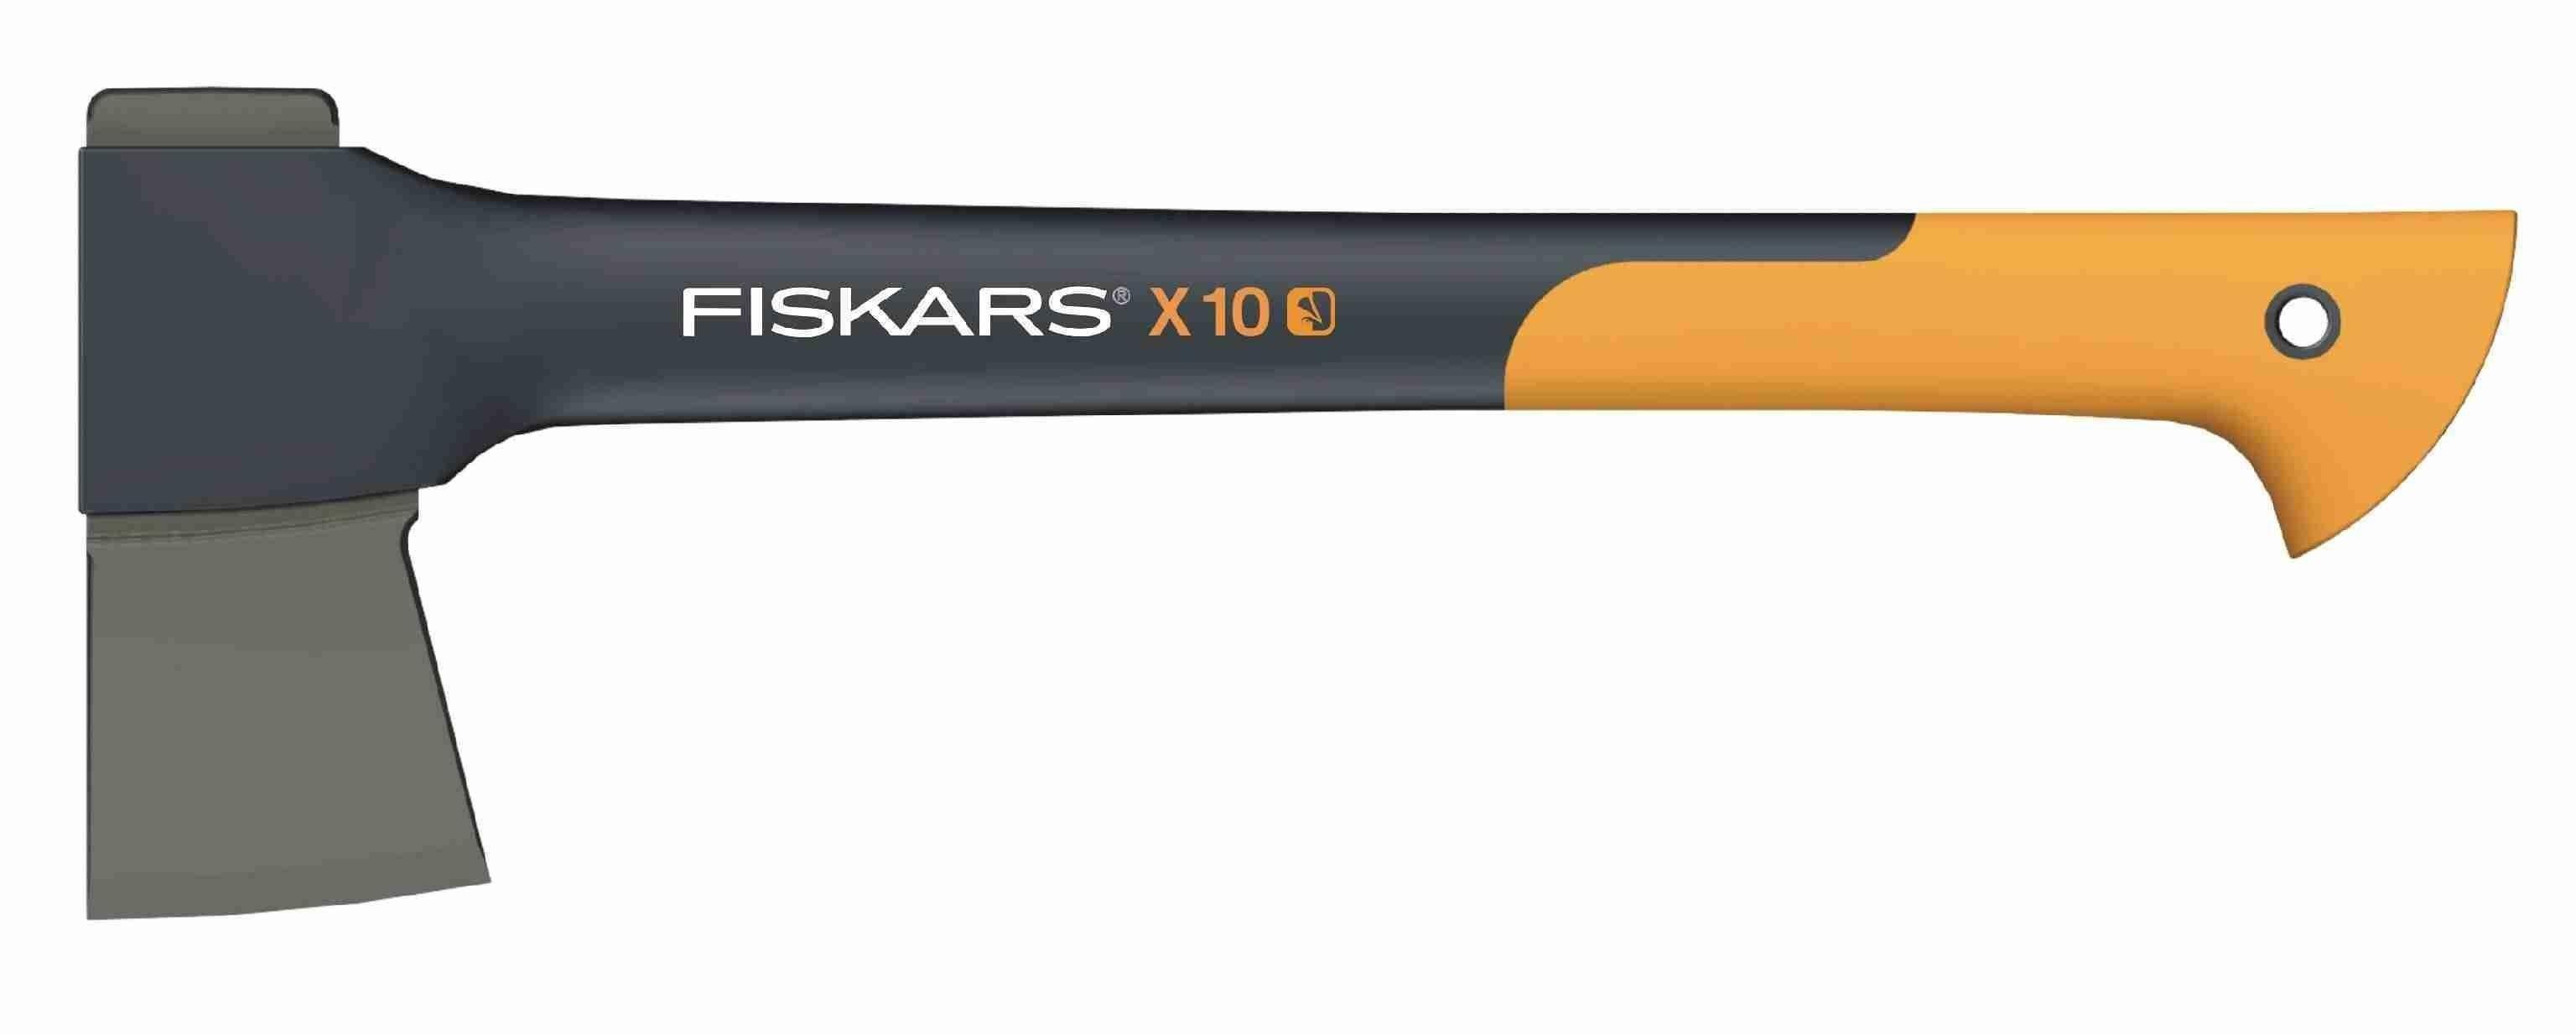 Топор плотницкий Fiskars X10